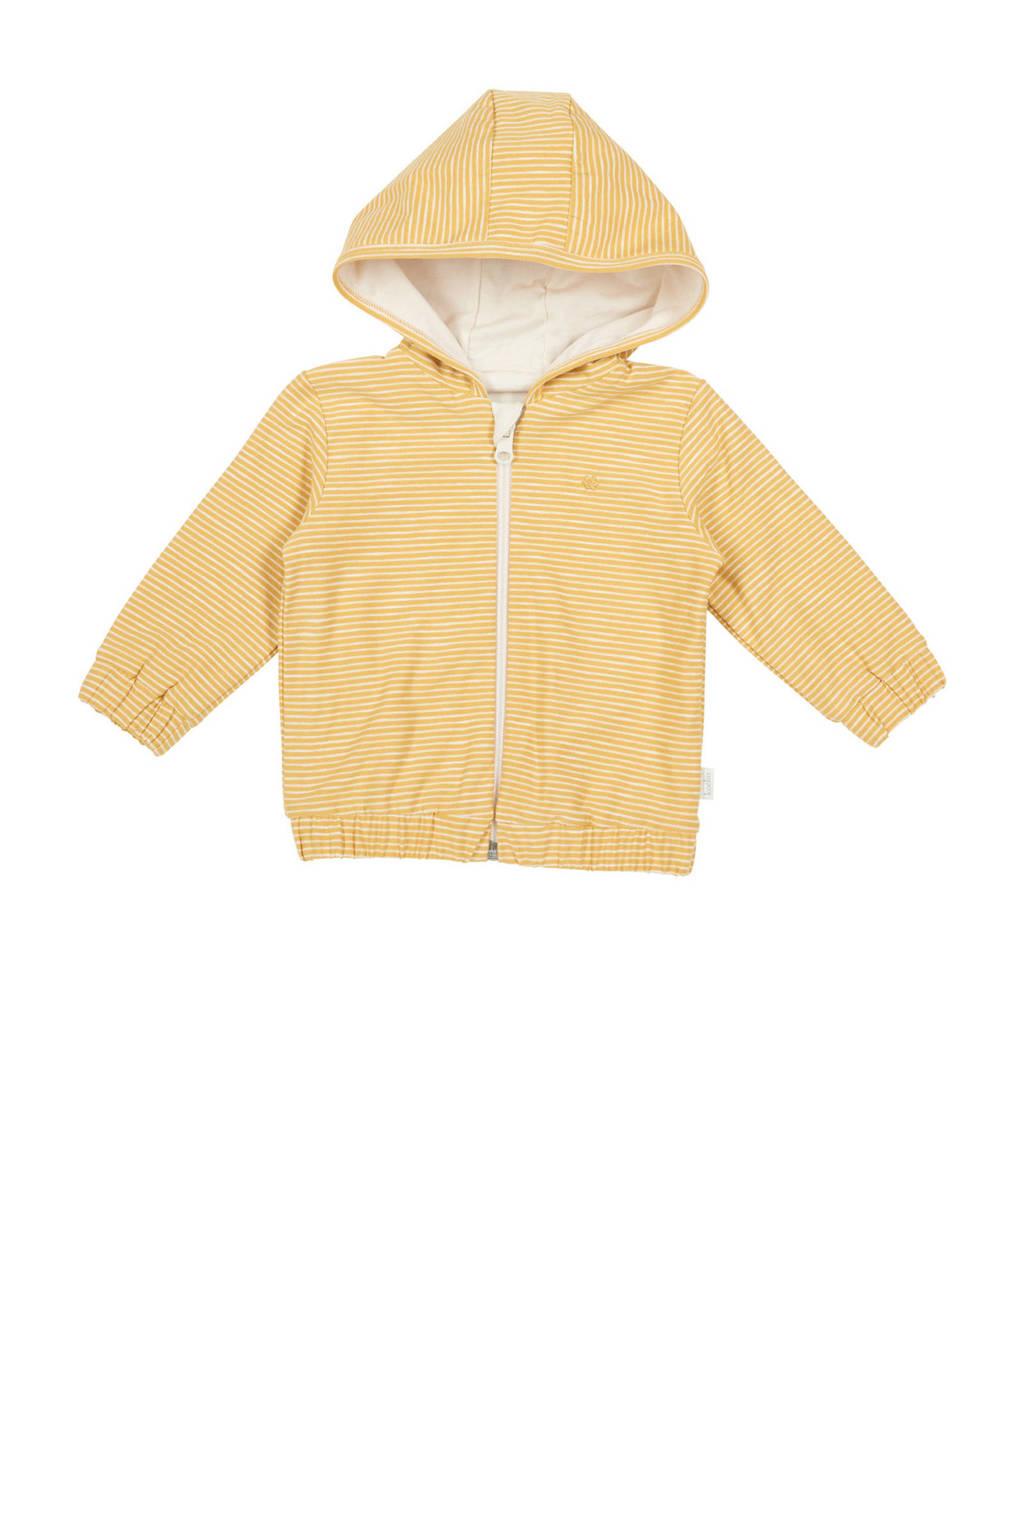 Koeka newborn baby gestreept vest Linescape oker, Oker